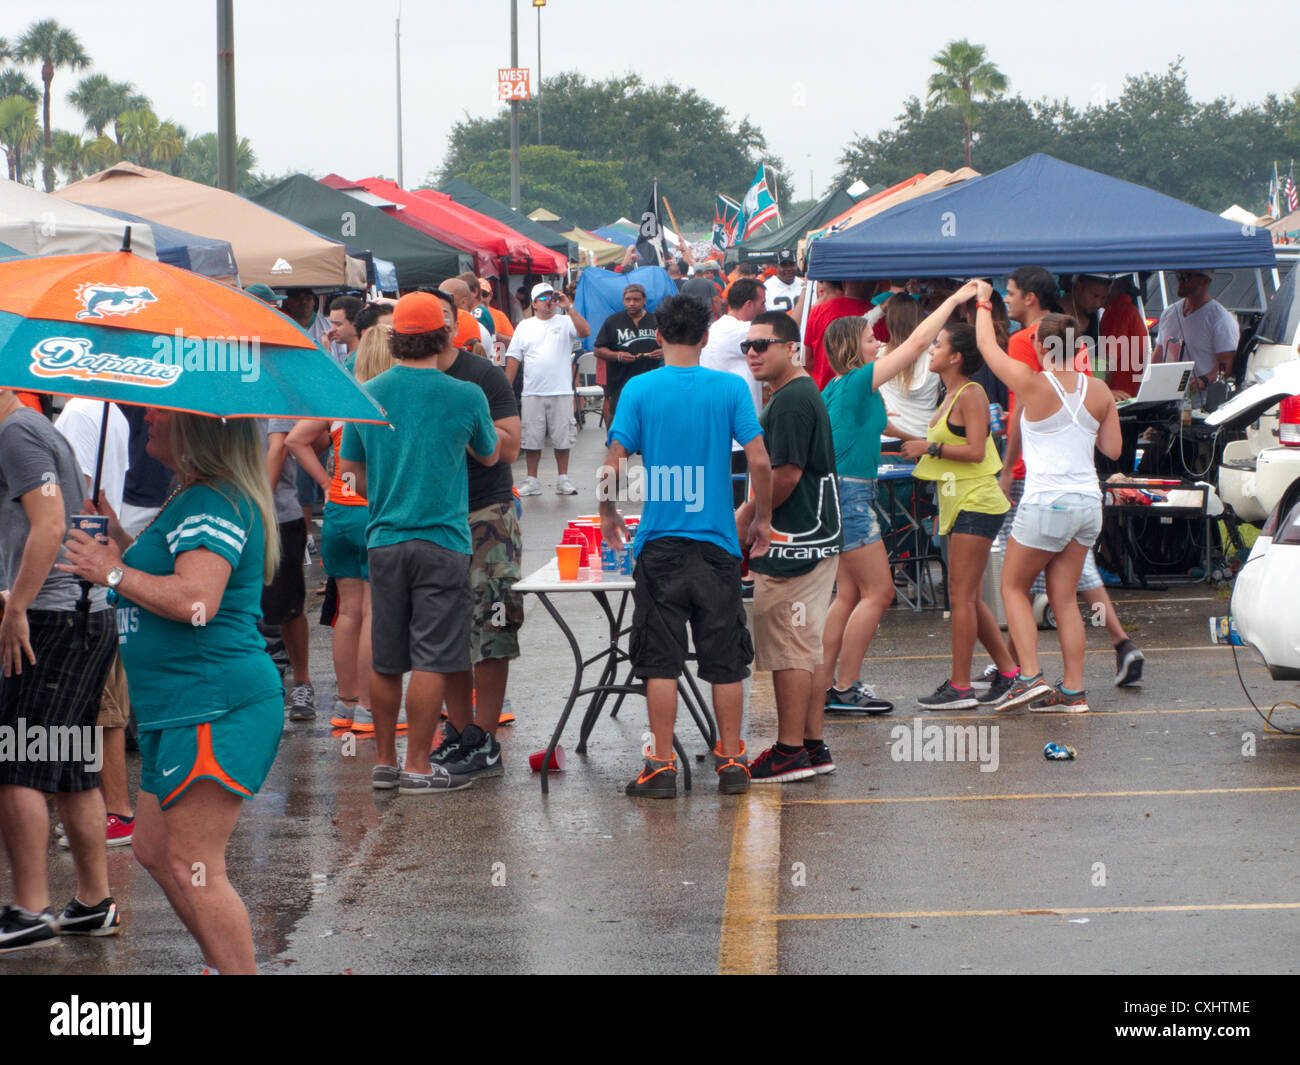 tailgate parties in the car park at sun life stadium miami florida usa - Stock Image